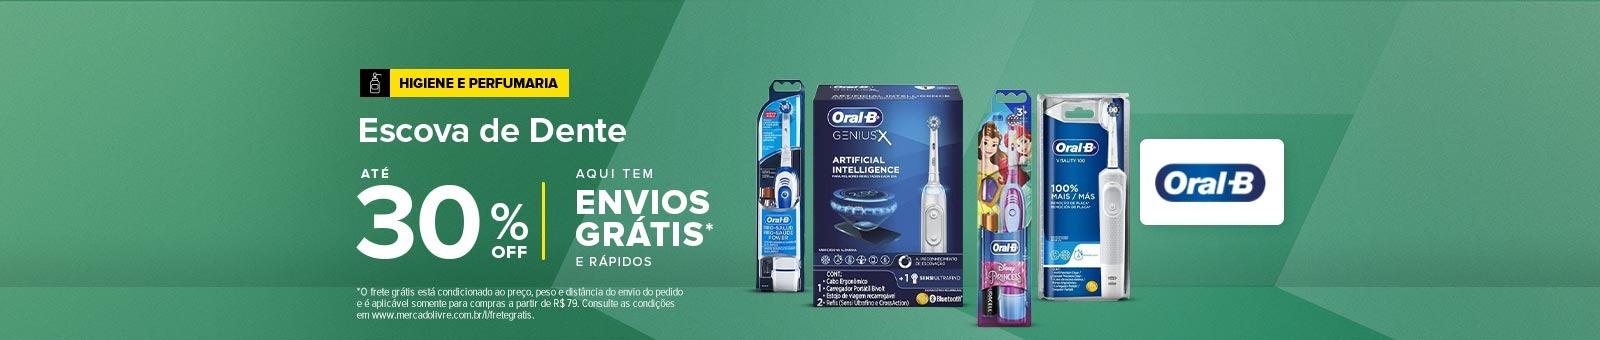 Oral B - Escova de Dente